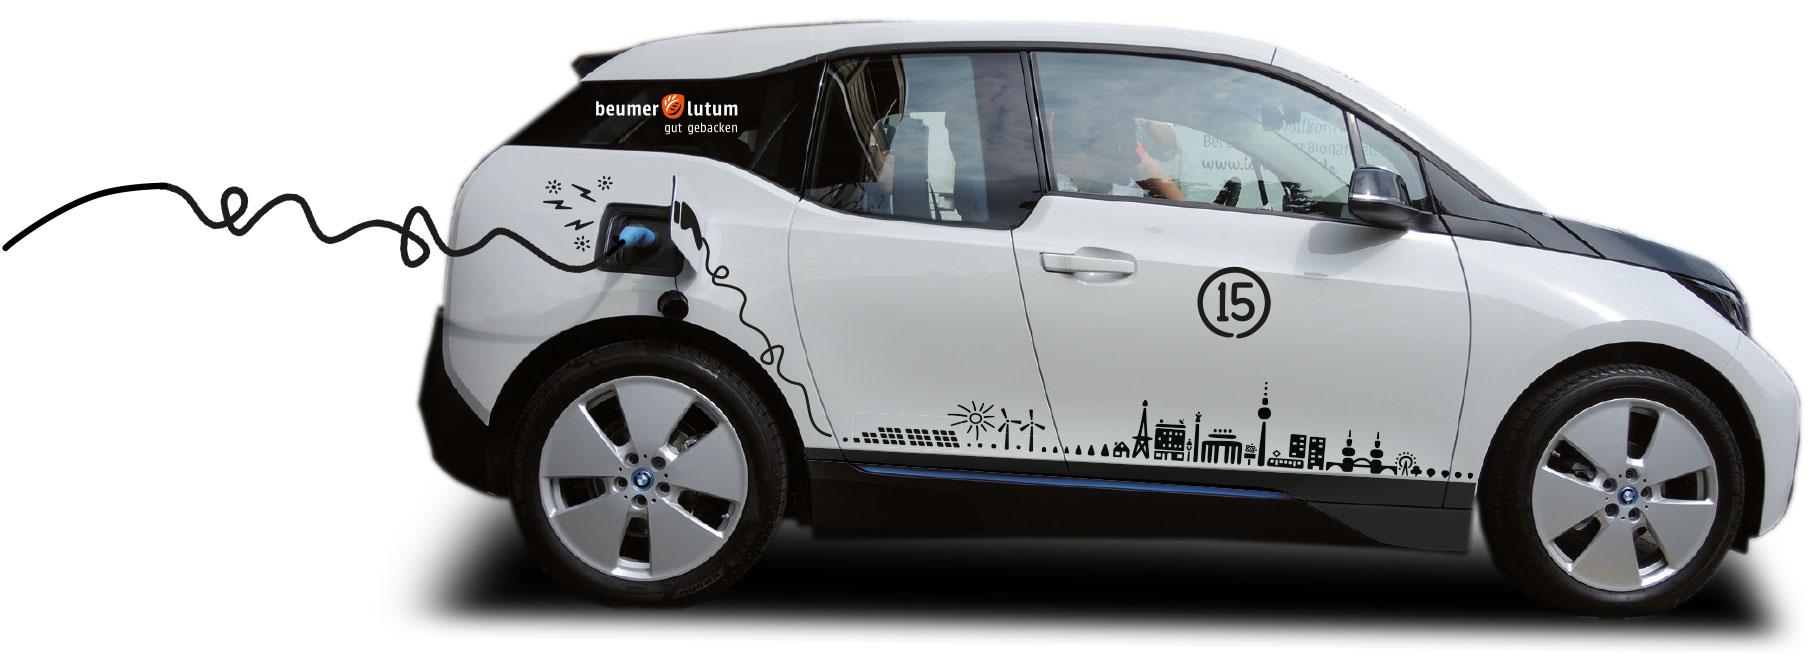 Beumer-Lutum Elektroauto